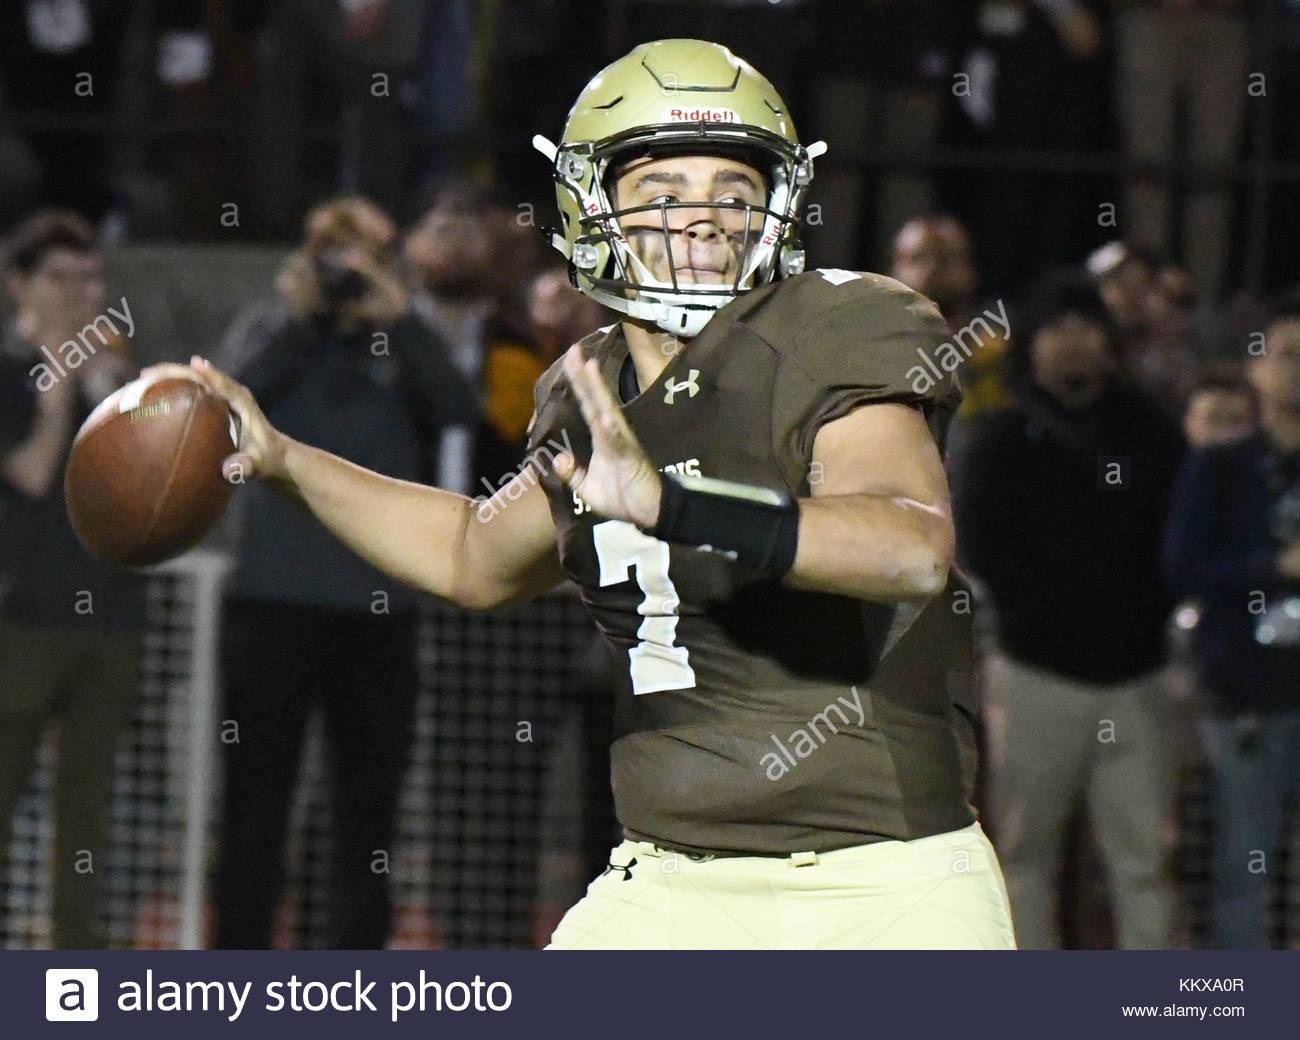 La Canada, California, USA. 1st Dec, 2017. St. Francis quarterback Darius Perrantes (7) passes against Rancho Verde - Stock Image